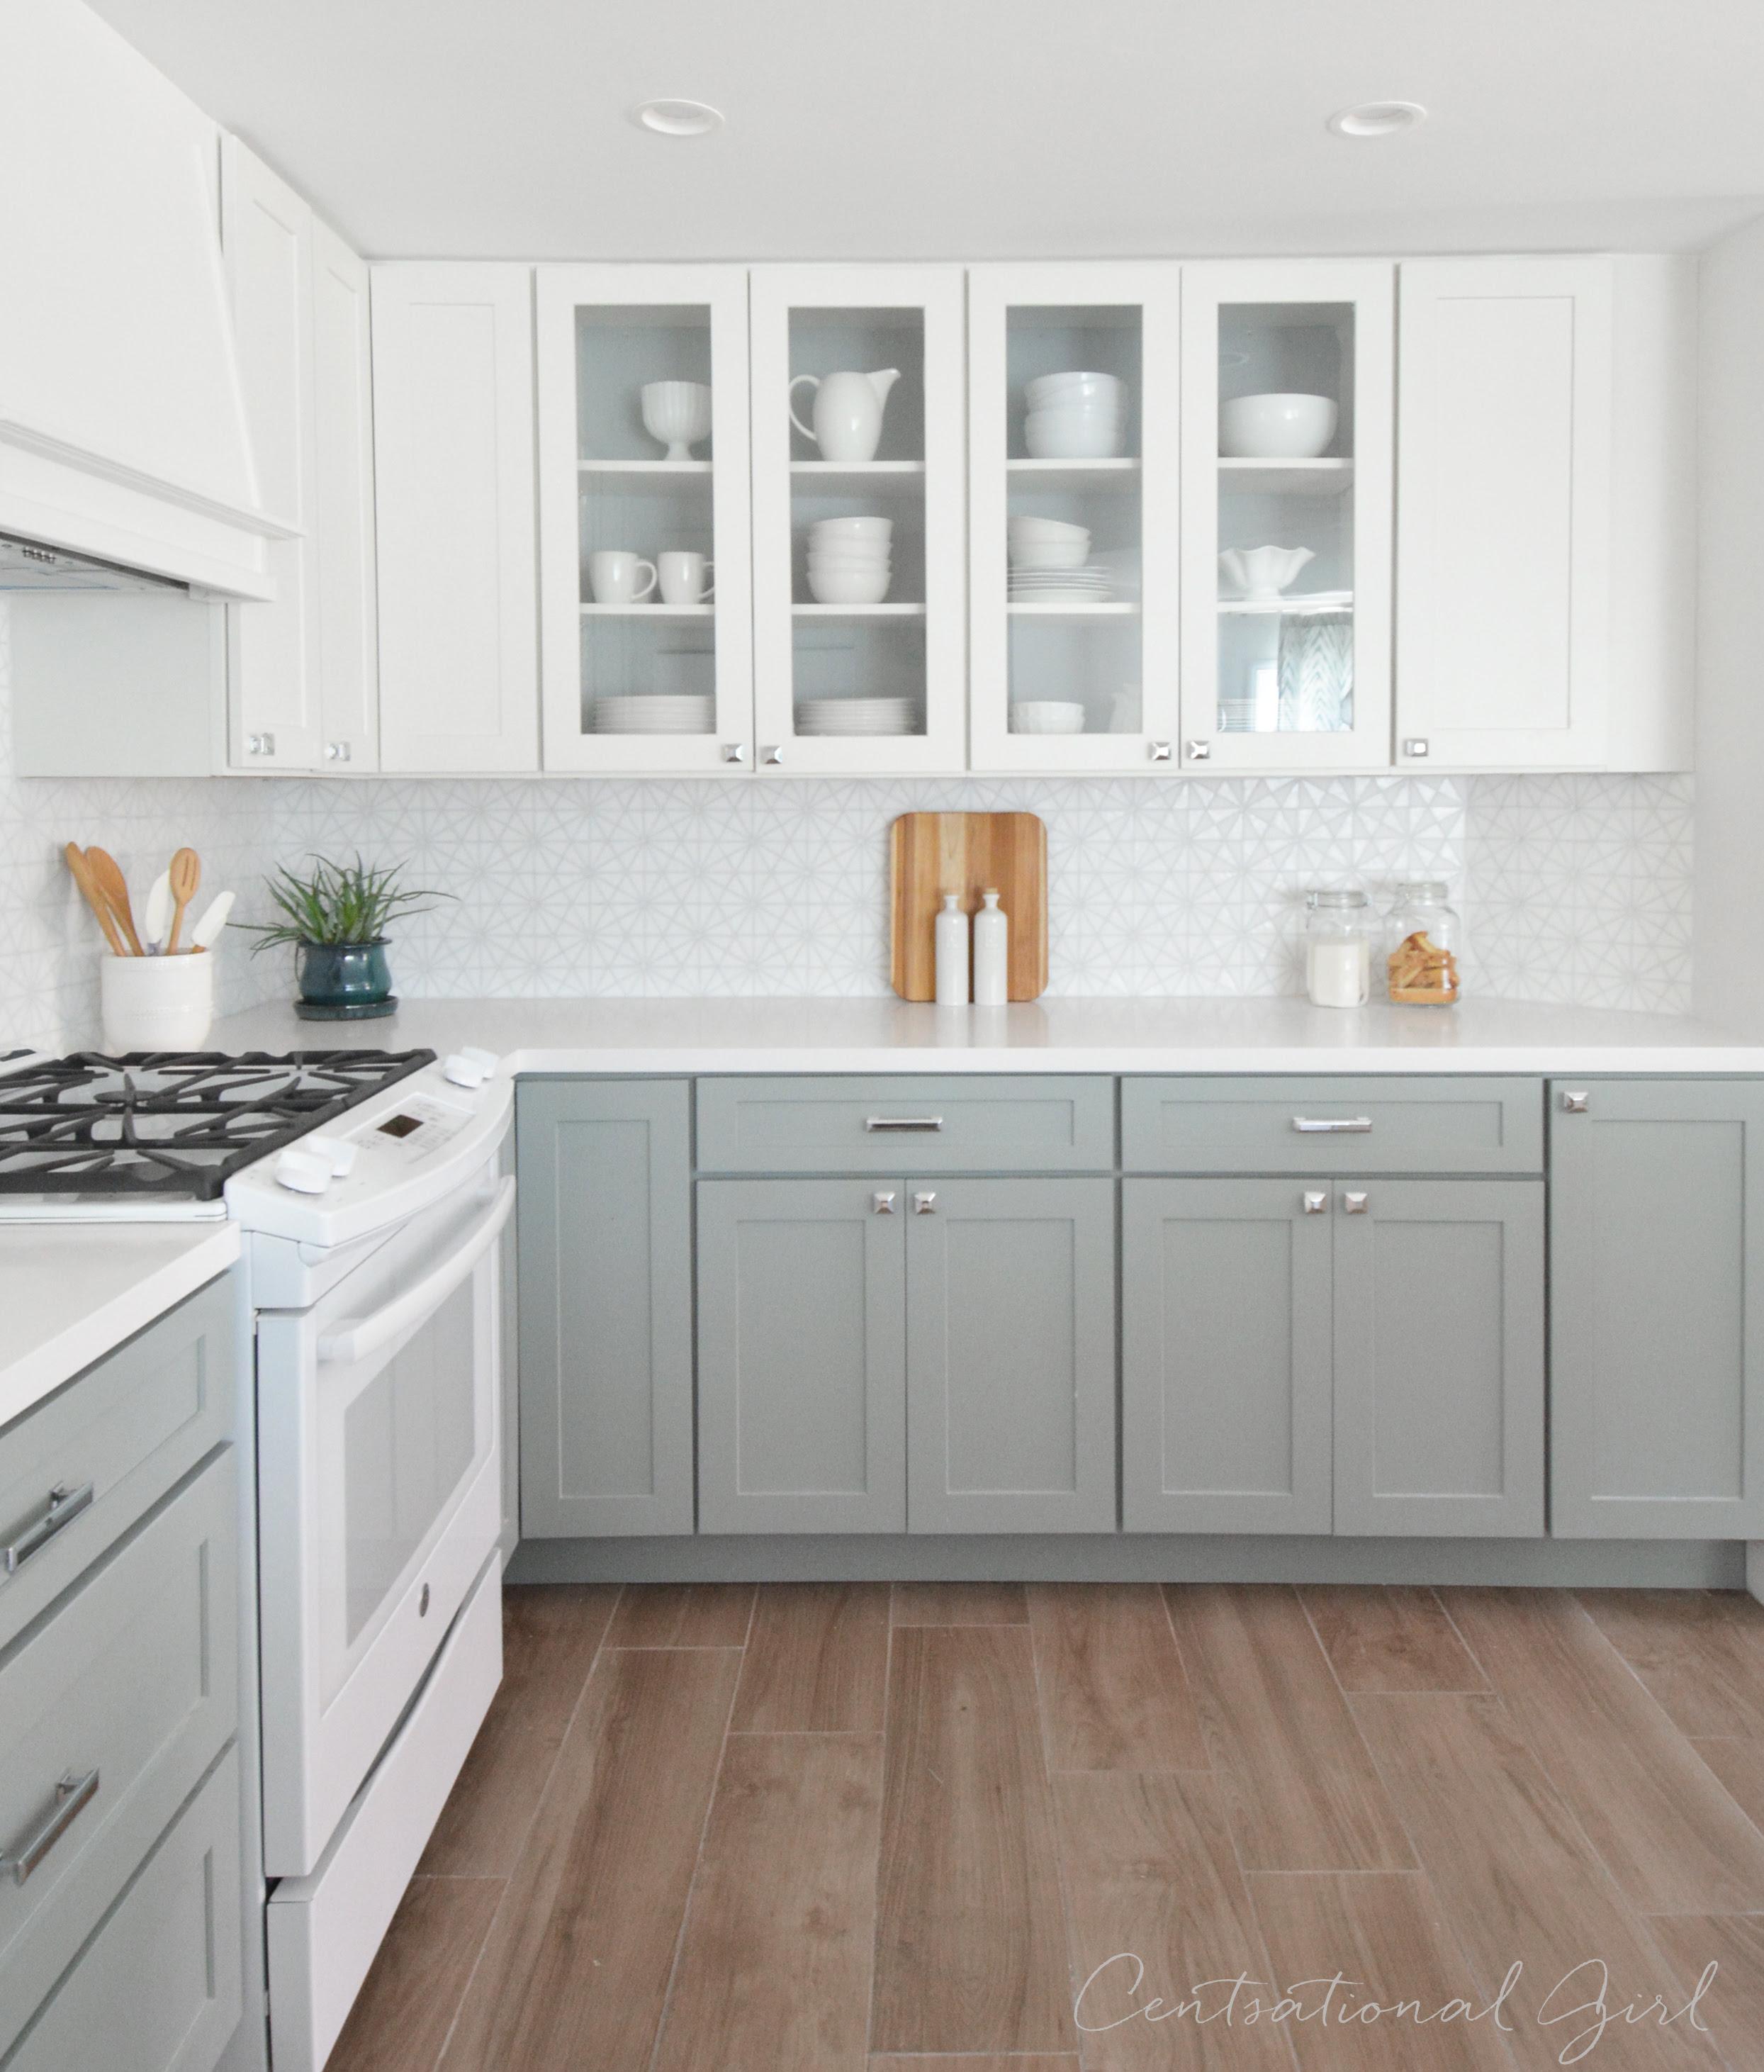 MarilynKelvin: Kitchen Remodel